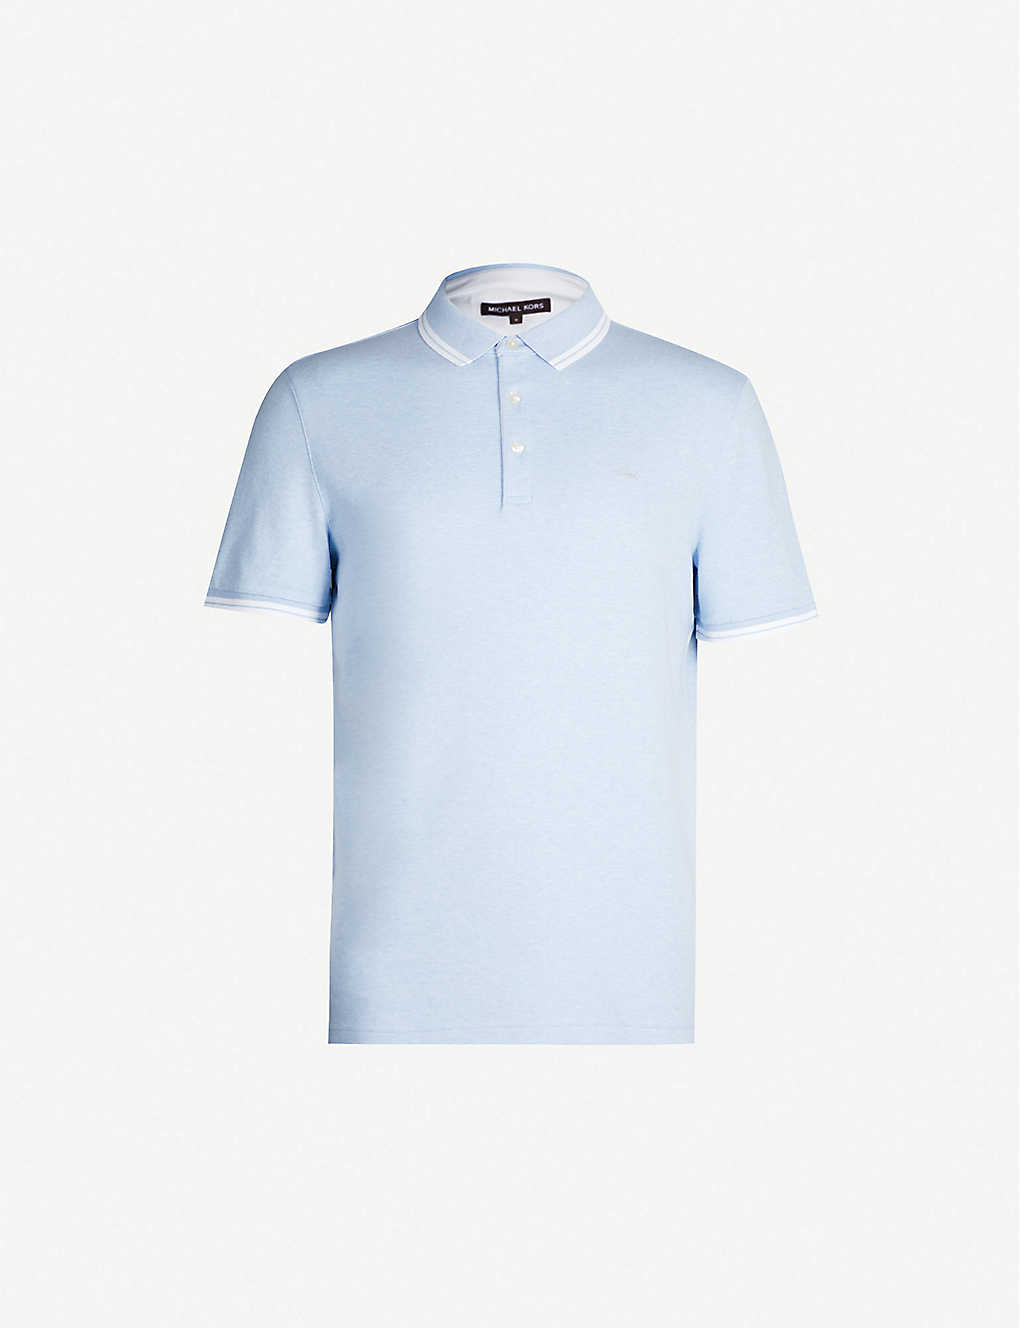 187dcb8a MICHAEL KORS - Striped-trims cotton-jersey polo shirt | Selfridges.com